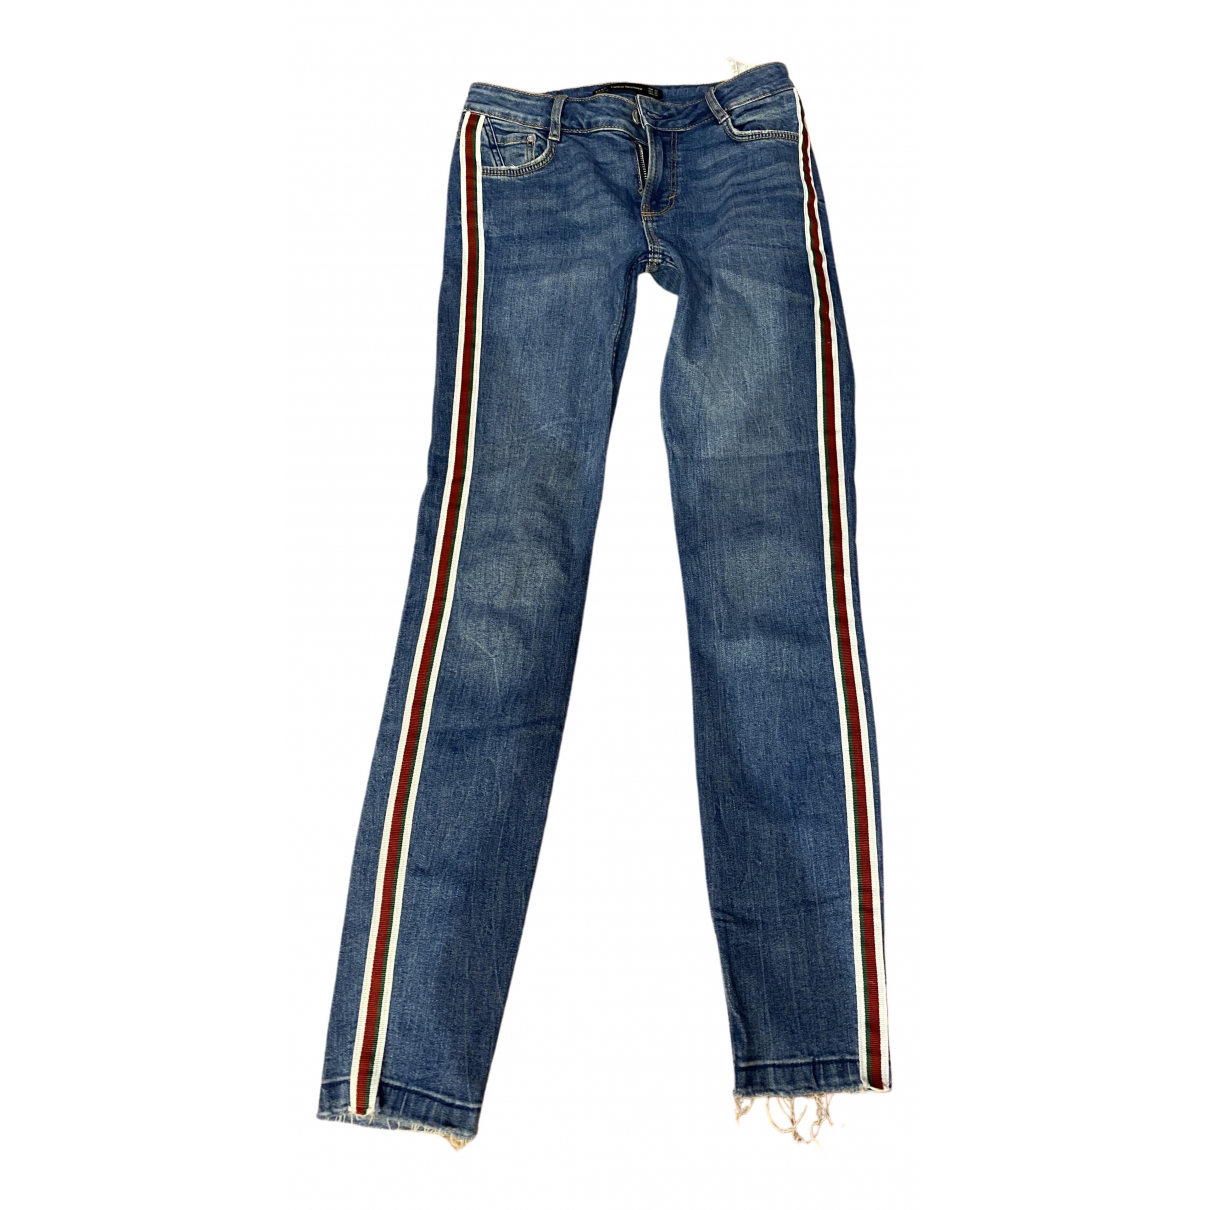 Pantalon en Denim - Vaquero Azul Zara